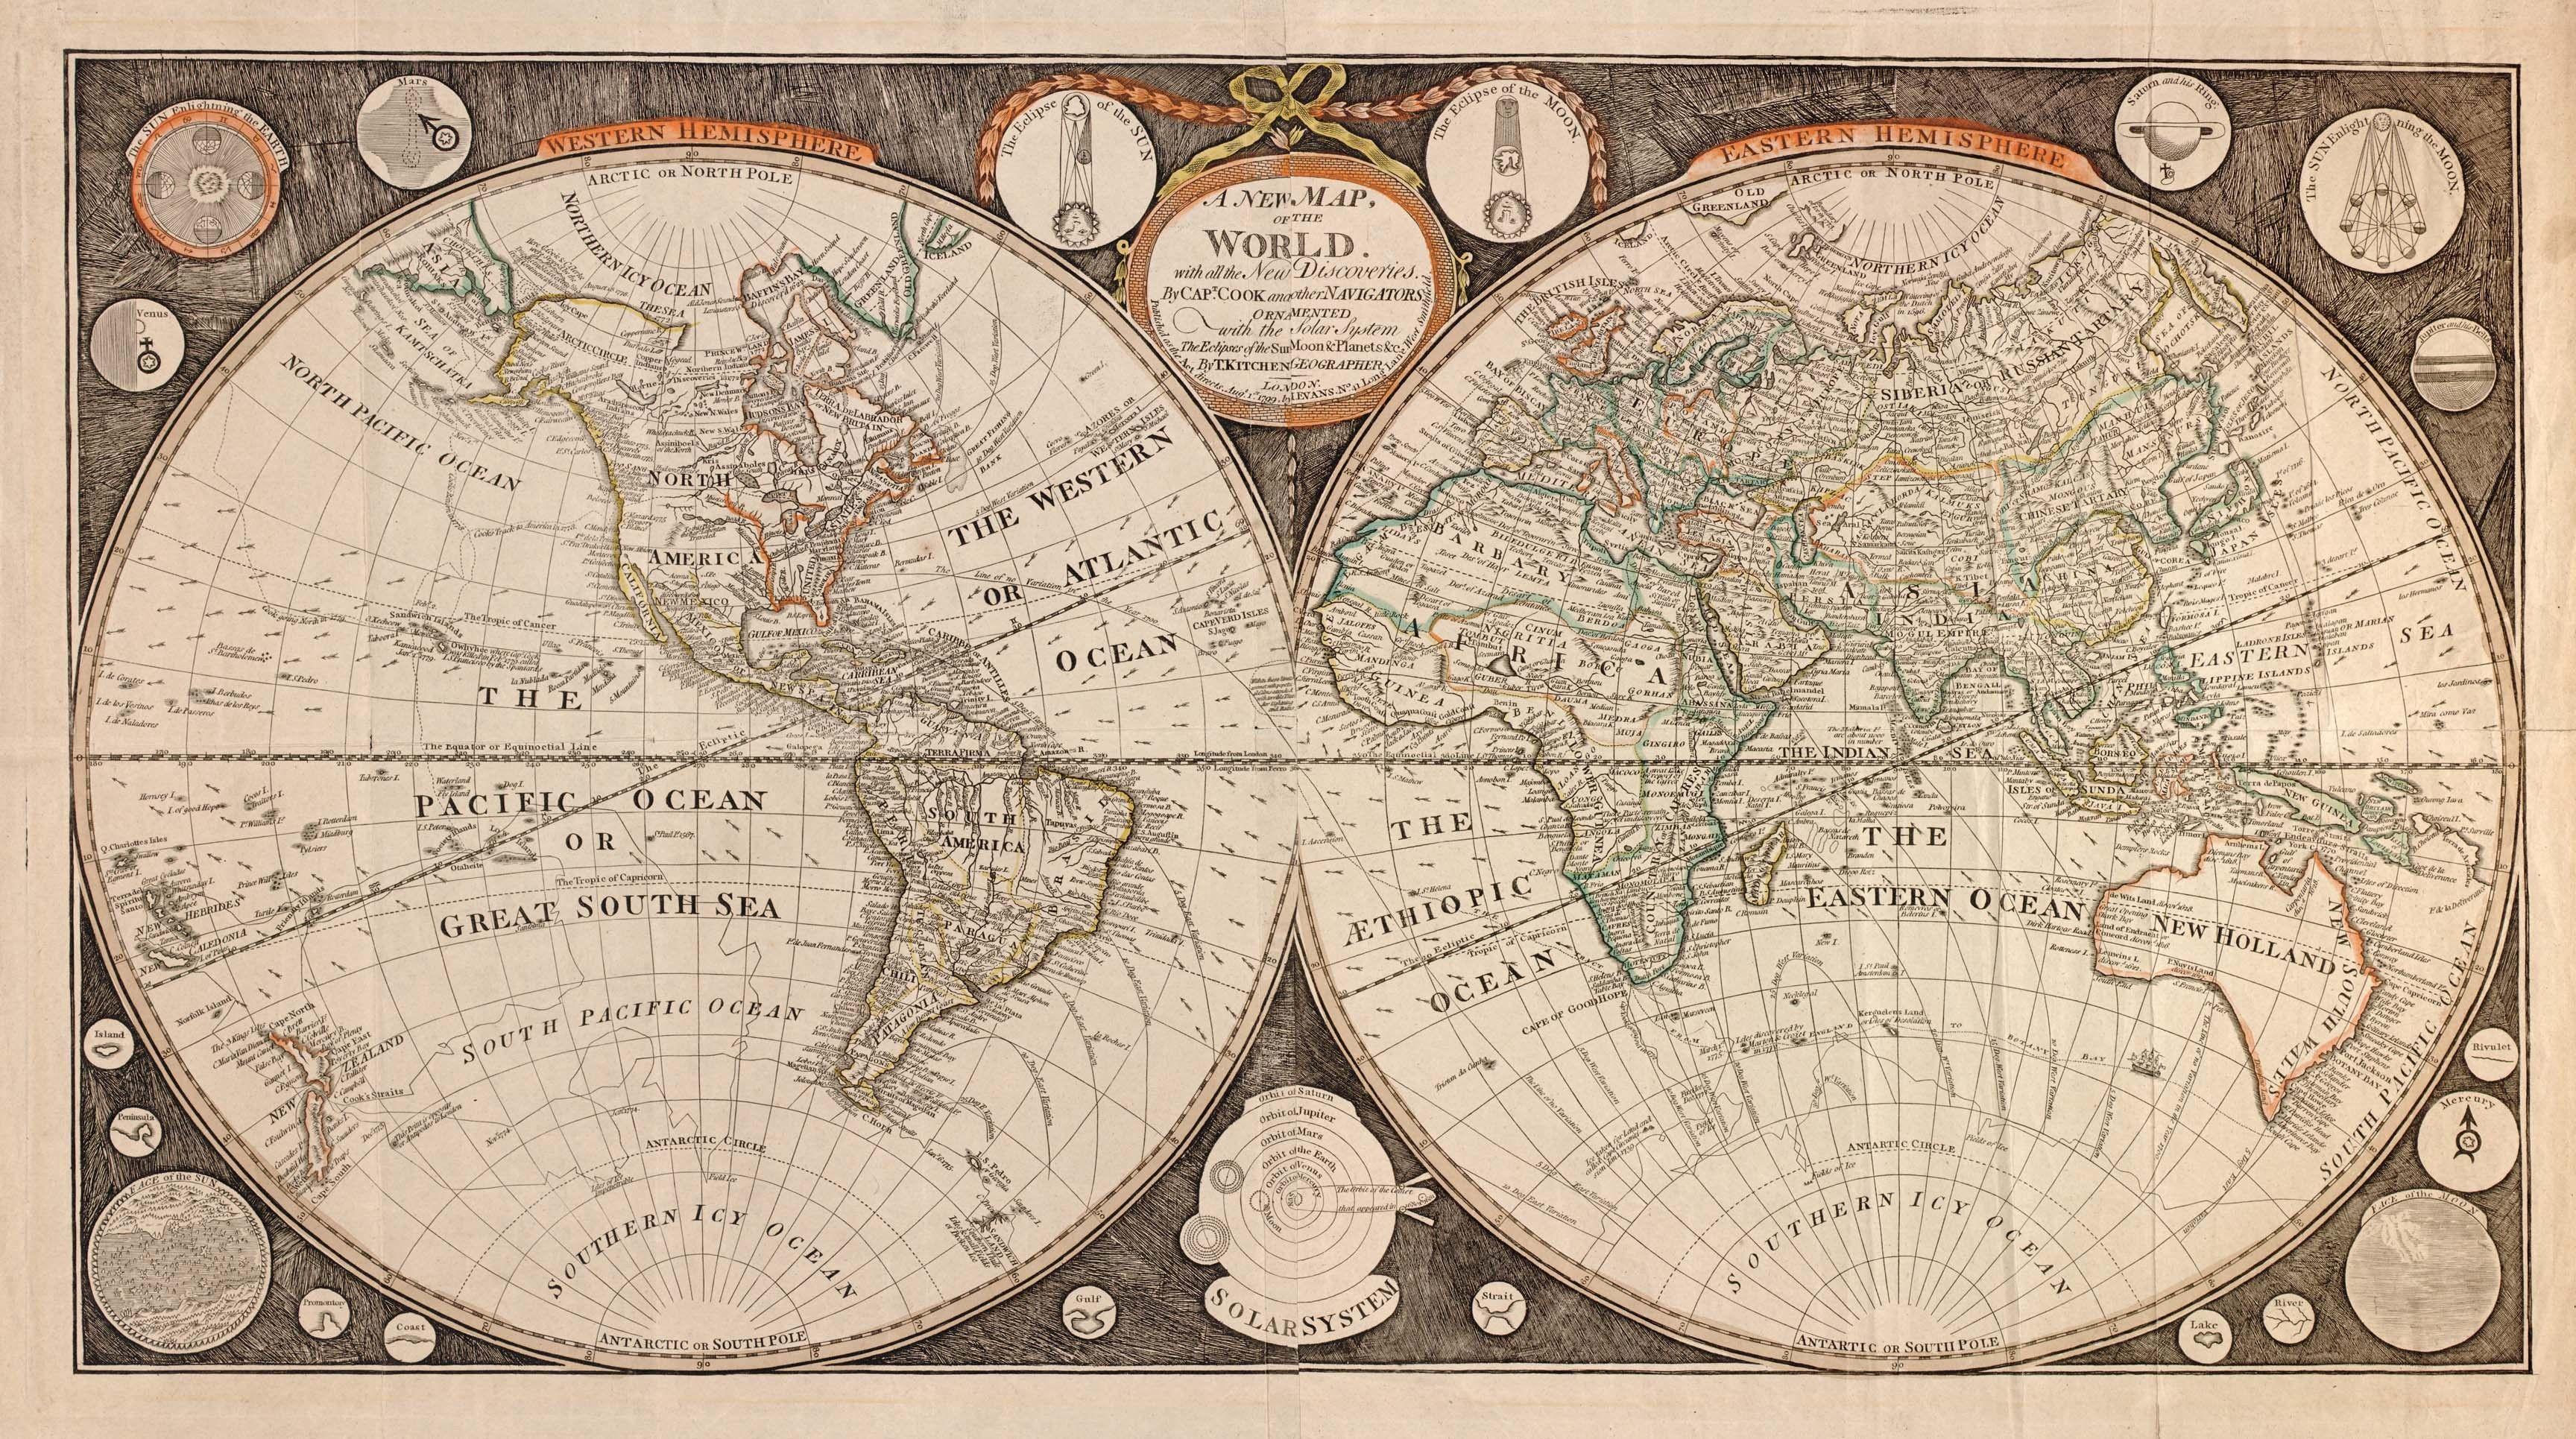 Historical world map 10g 34561931 diy crafts pinterest historical world map 10g 34561931 gumiabroncs Gallery